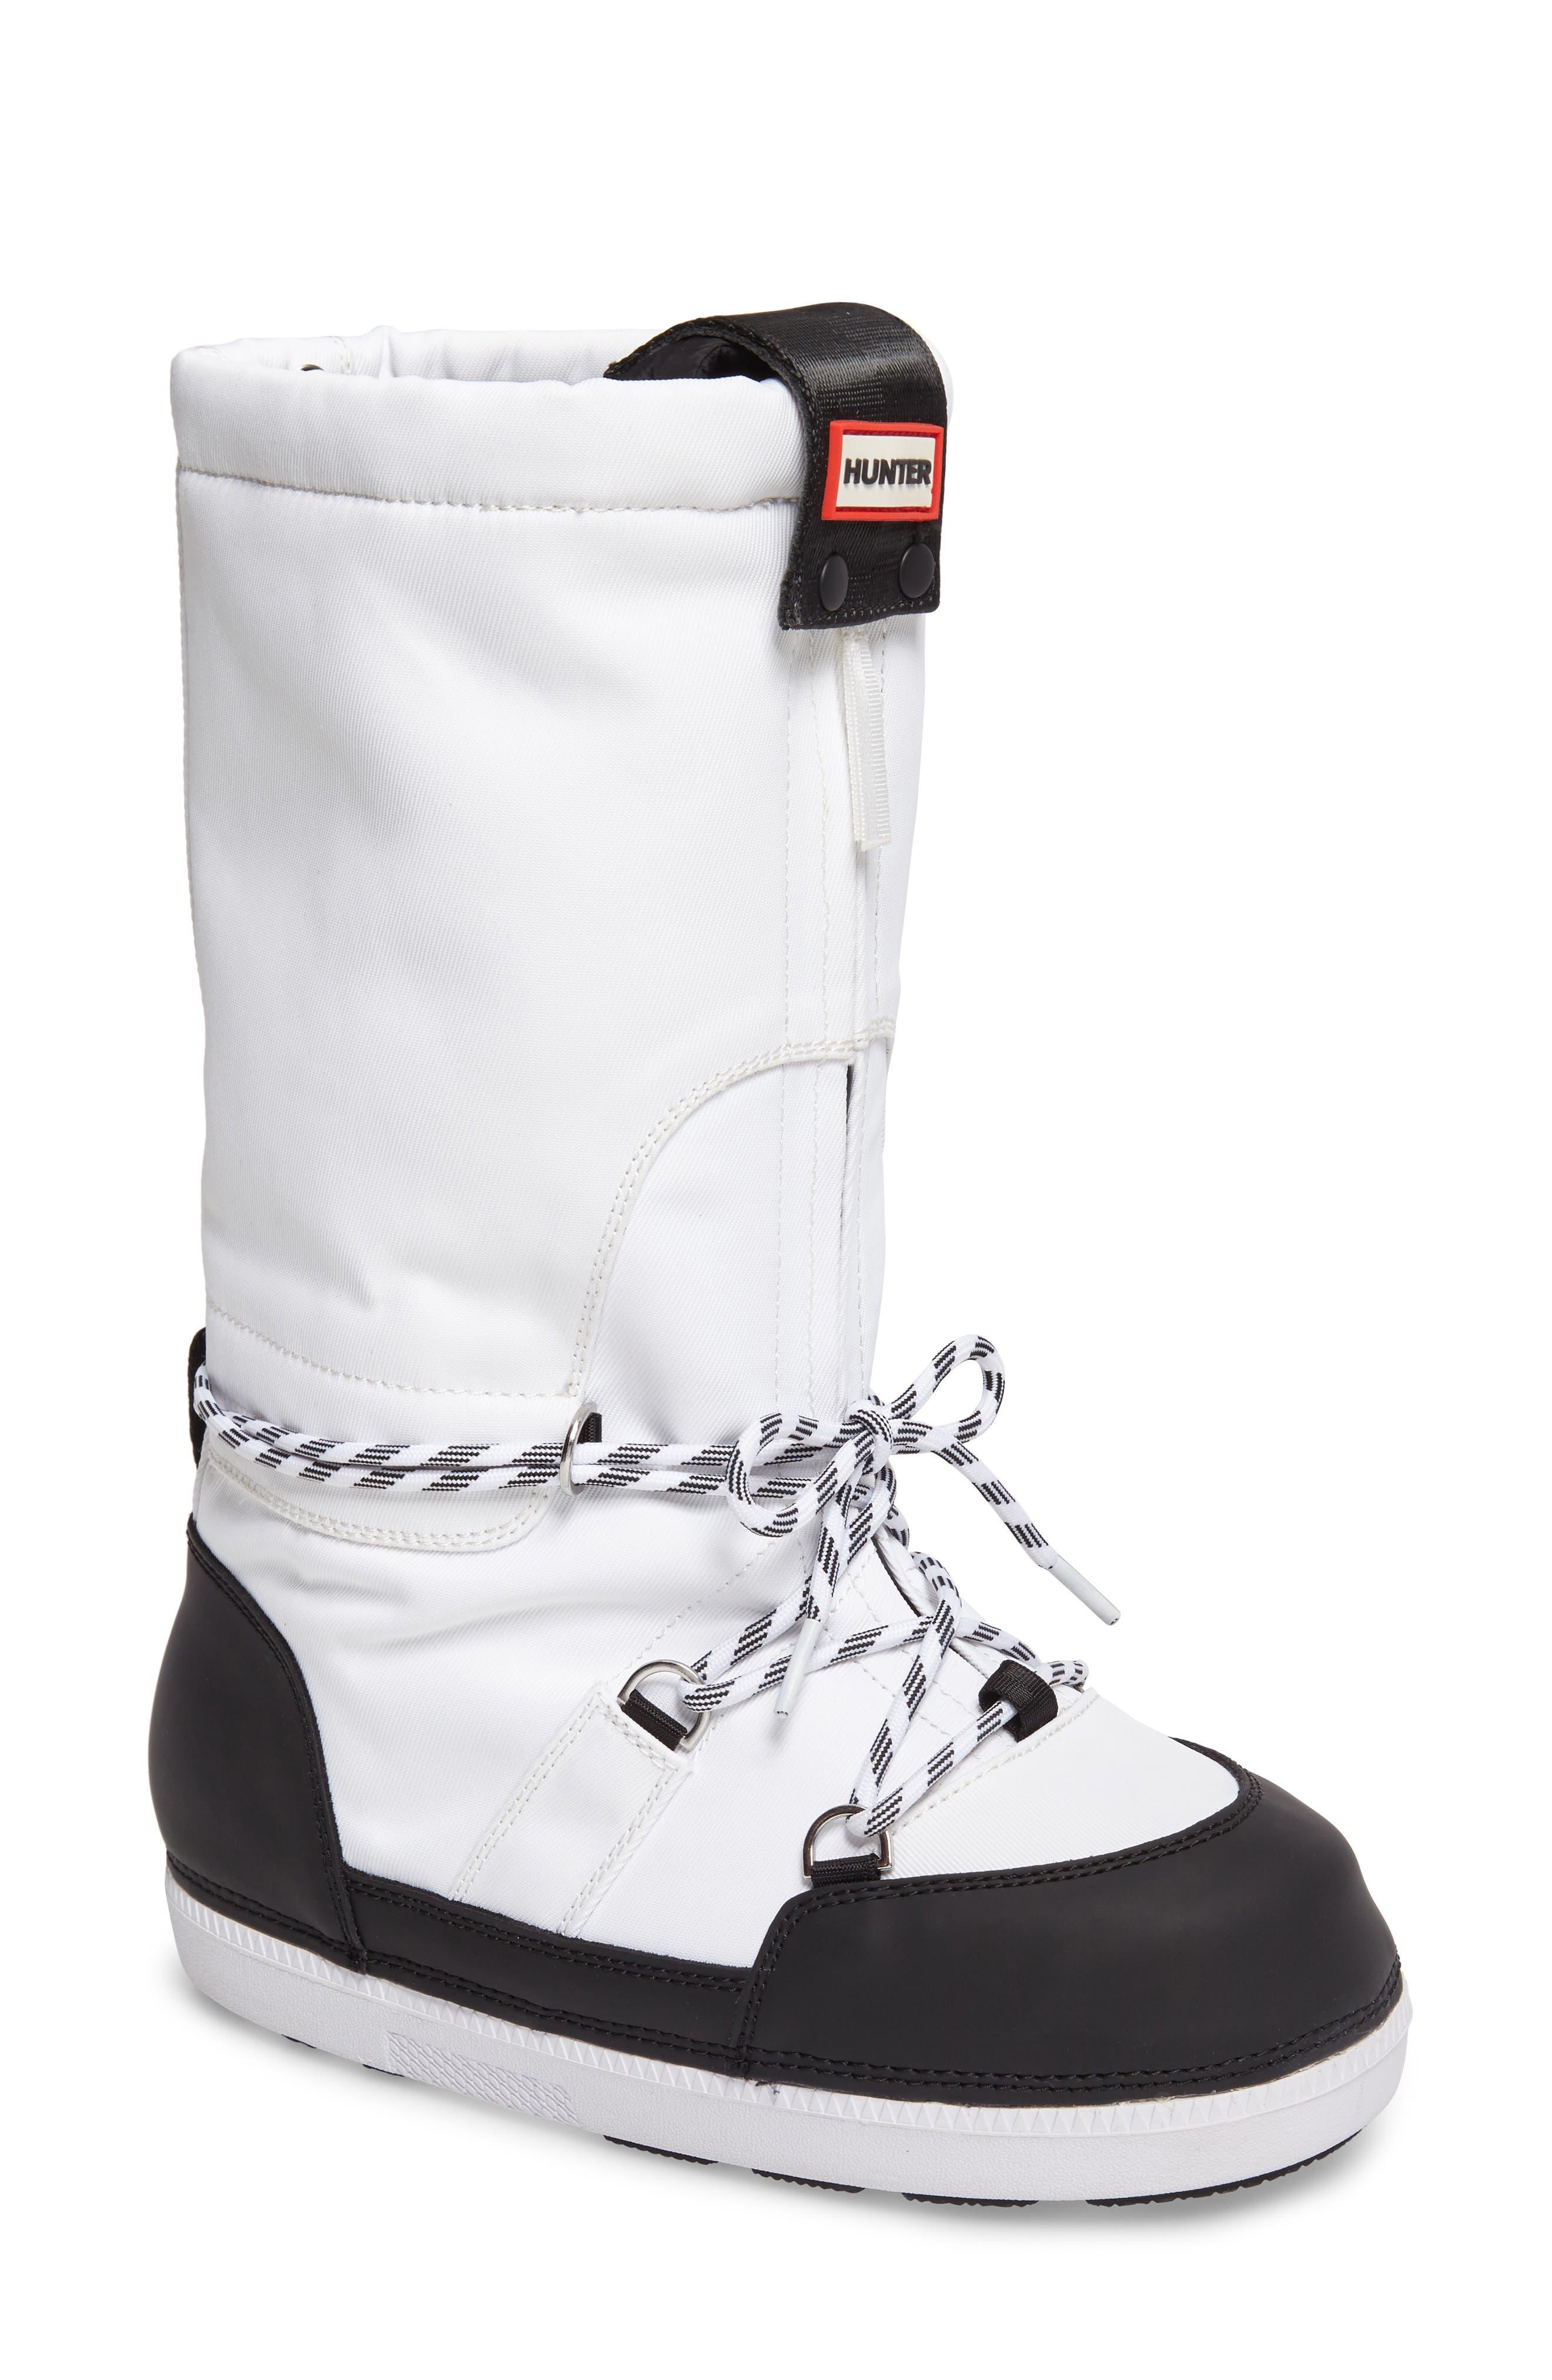 Main Image - Hunter Original Waterproof Snow Boot (Women)